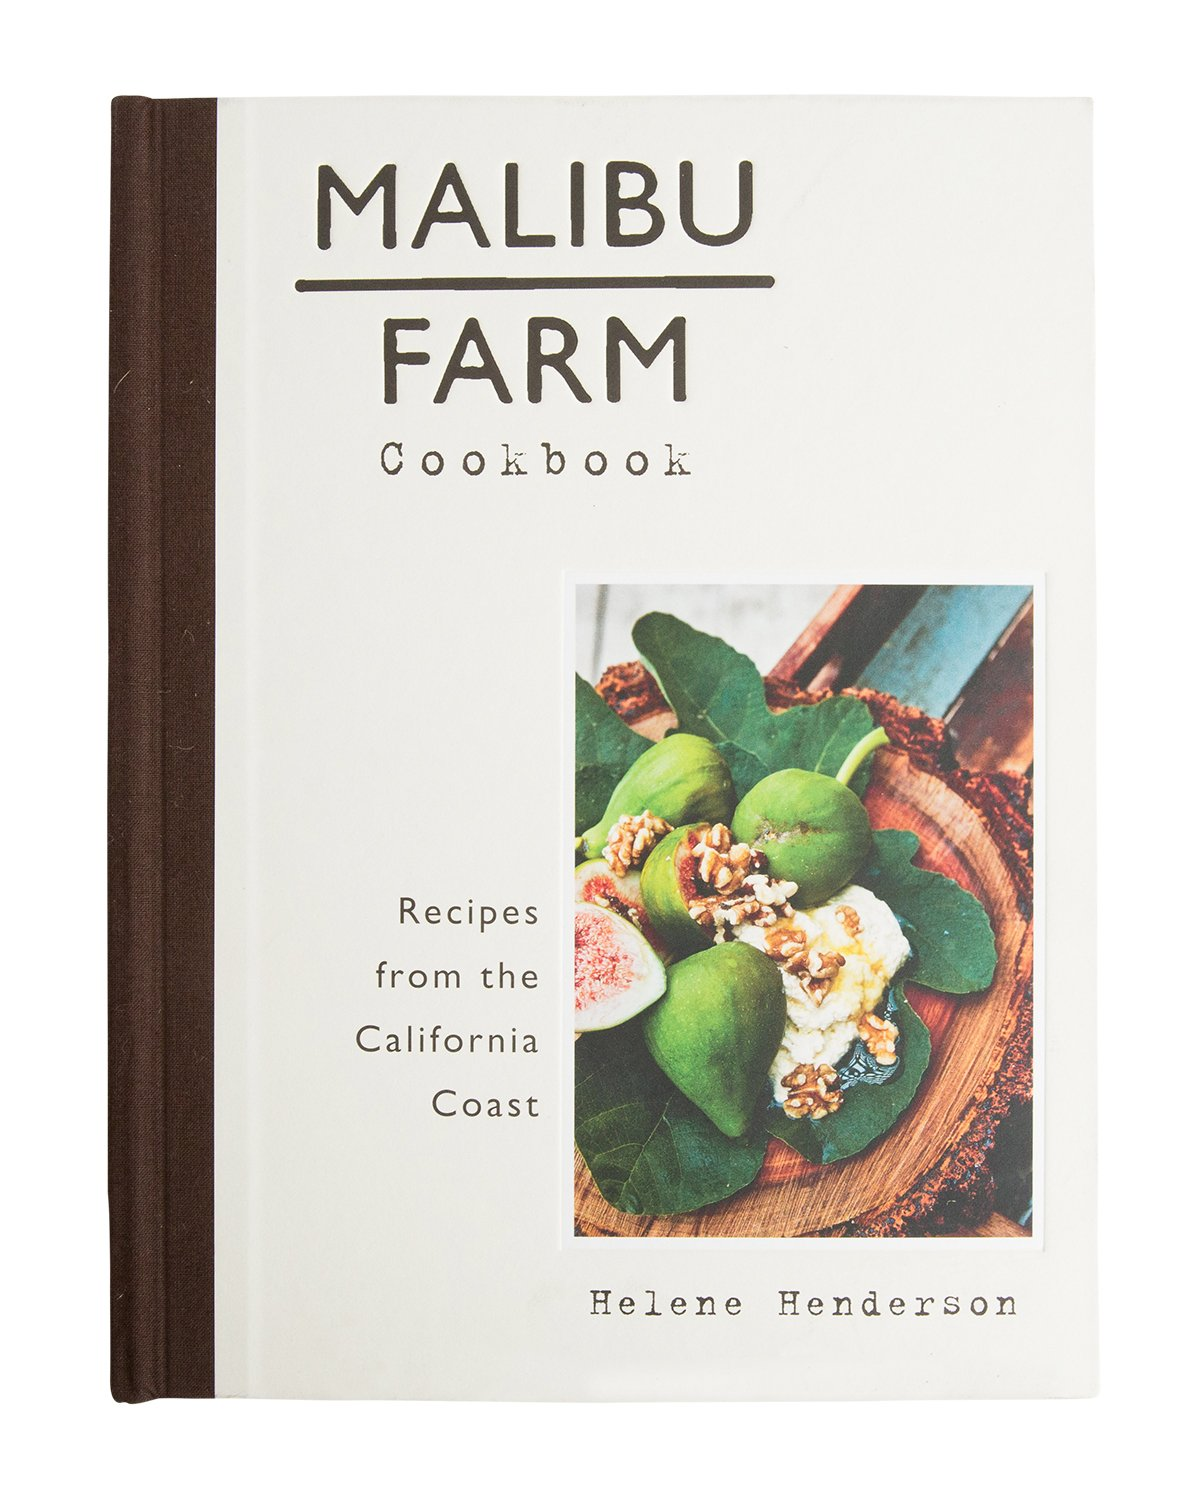 Malibu_Farm_1 2.jpg